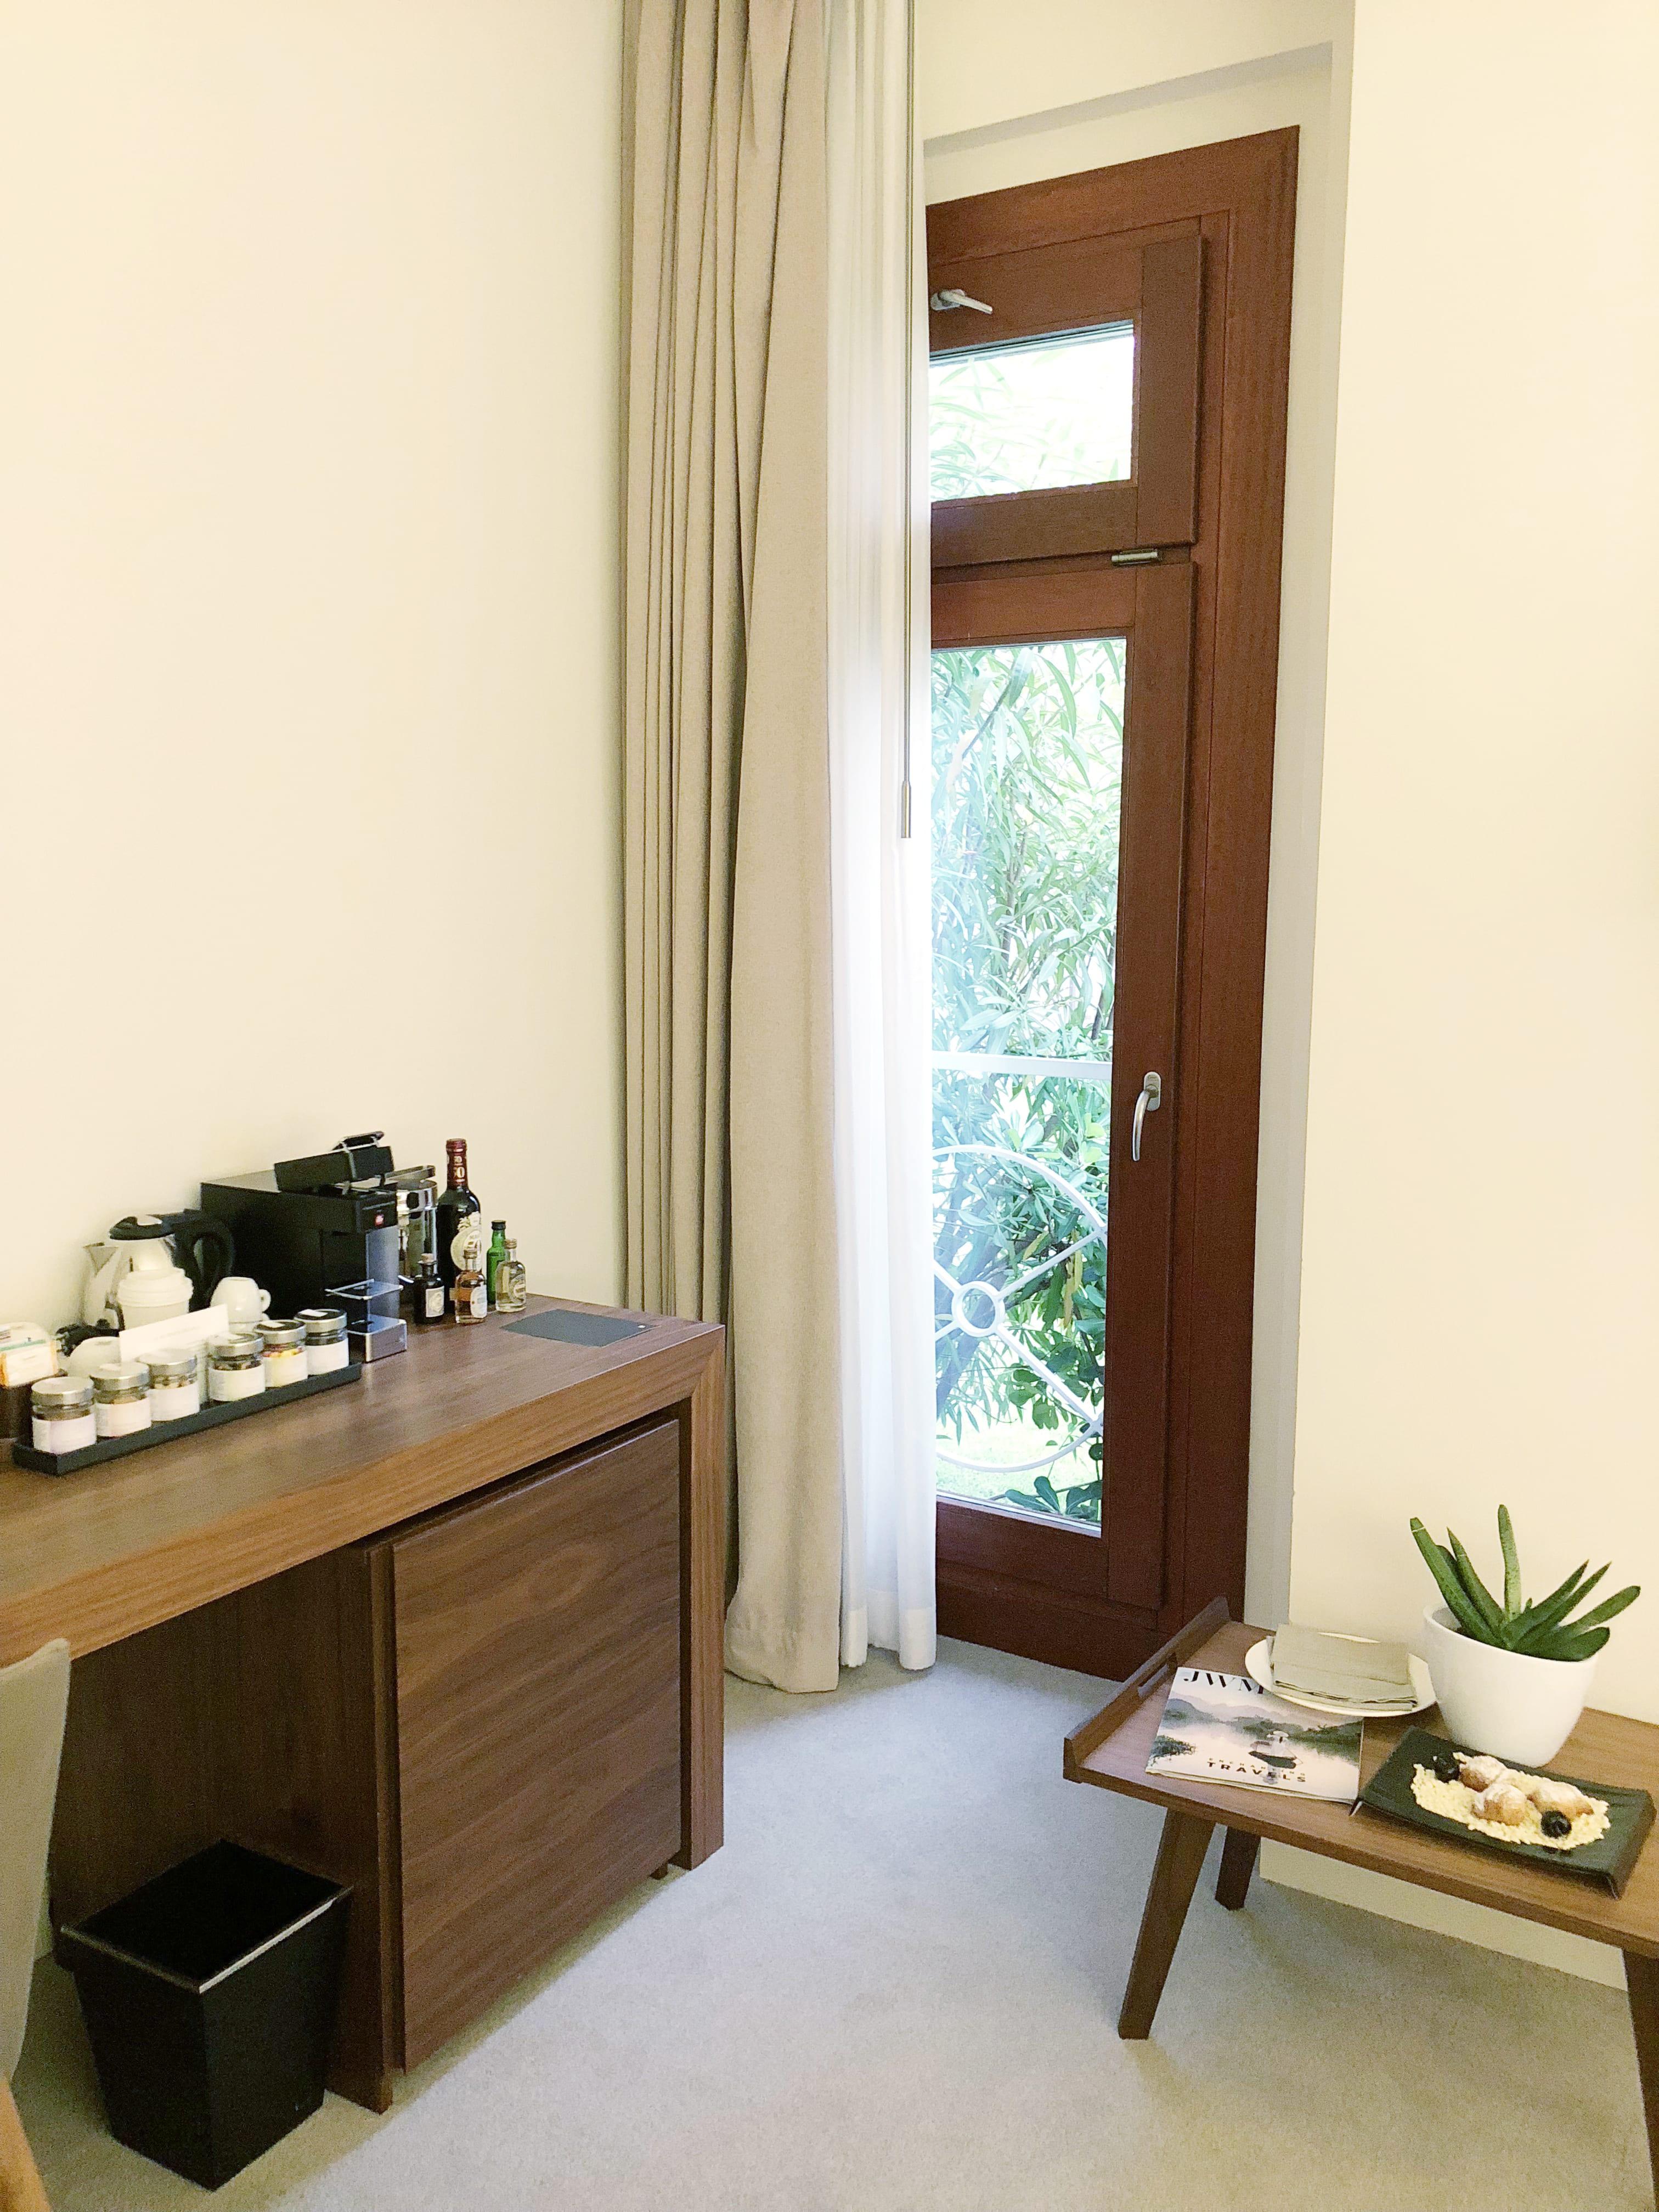 Jw marriott venice italy ulvieto guest suite